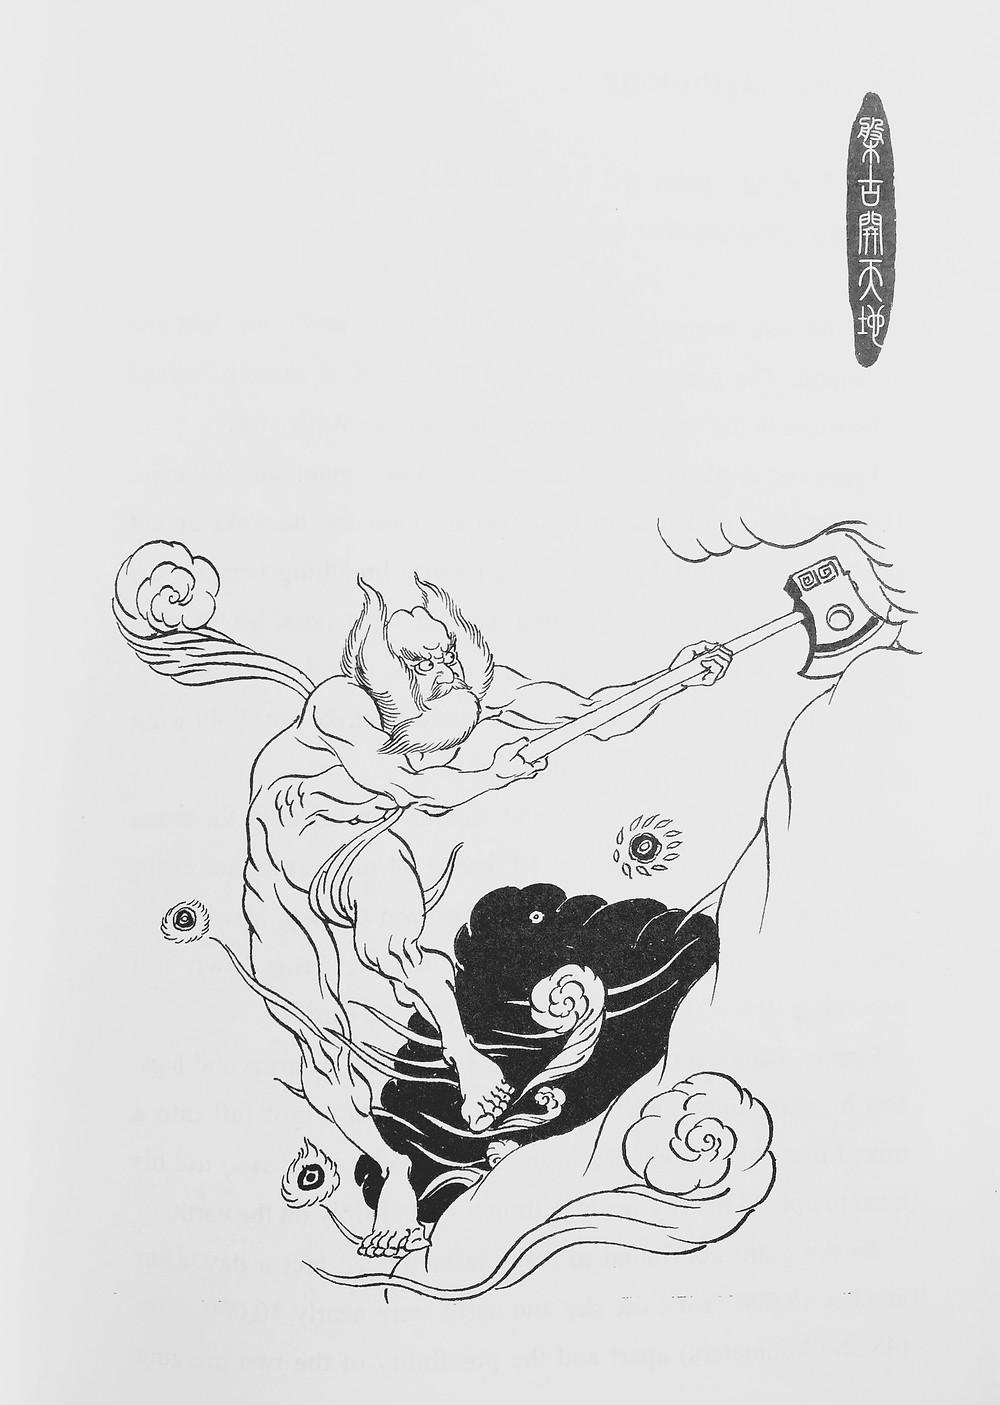 "'Pan Gu Kai Tian Di' - image from the book ""Chinese Mythology"""